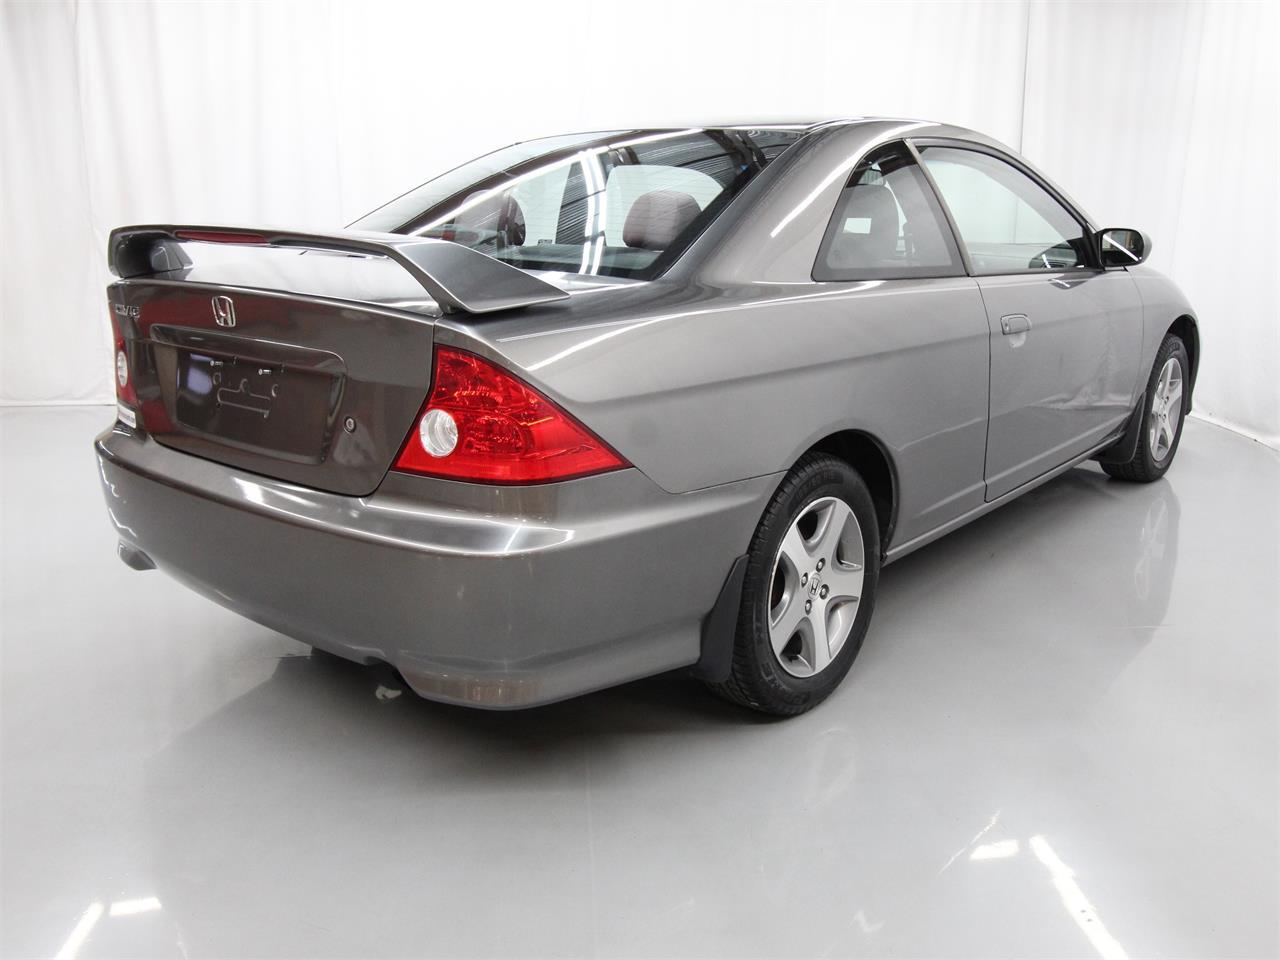 2004 Honda Civic (CC-1337469) for sale in Christiansburg, Virginia